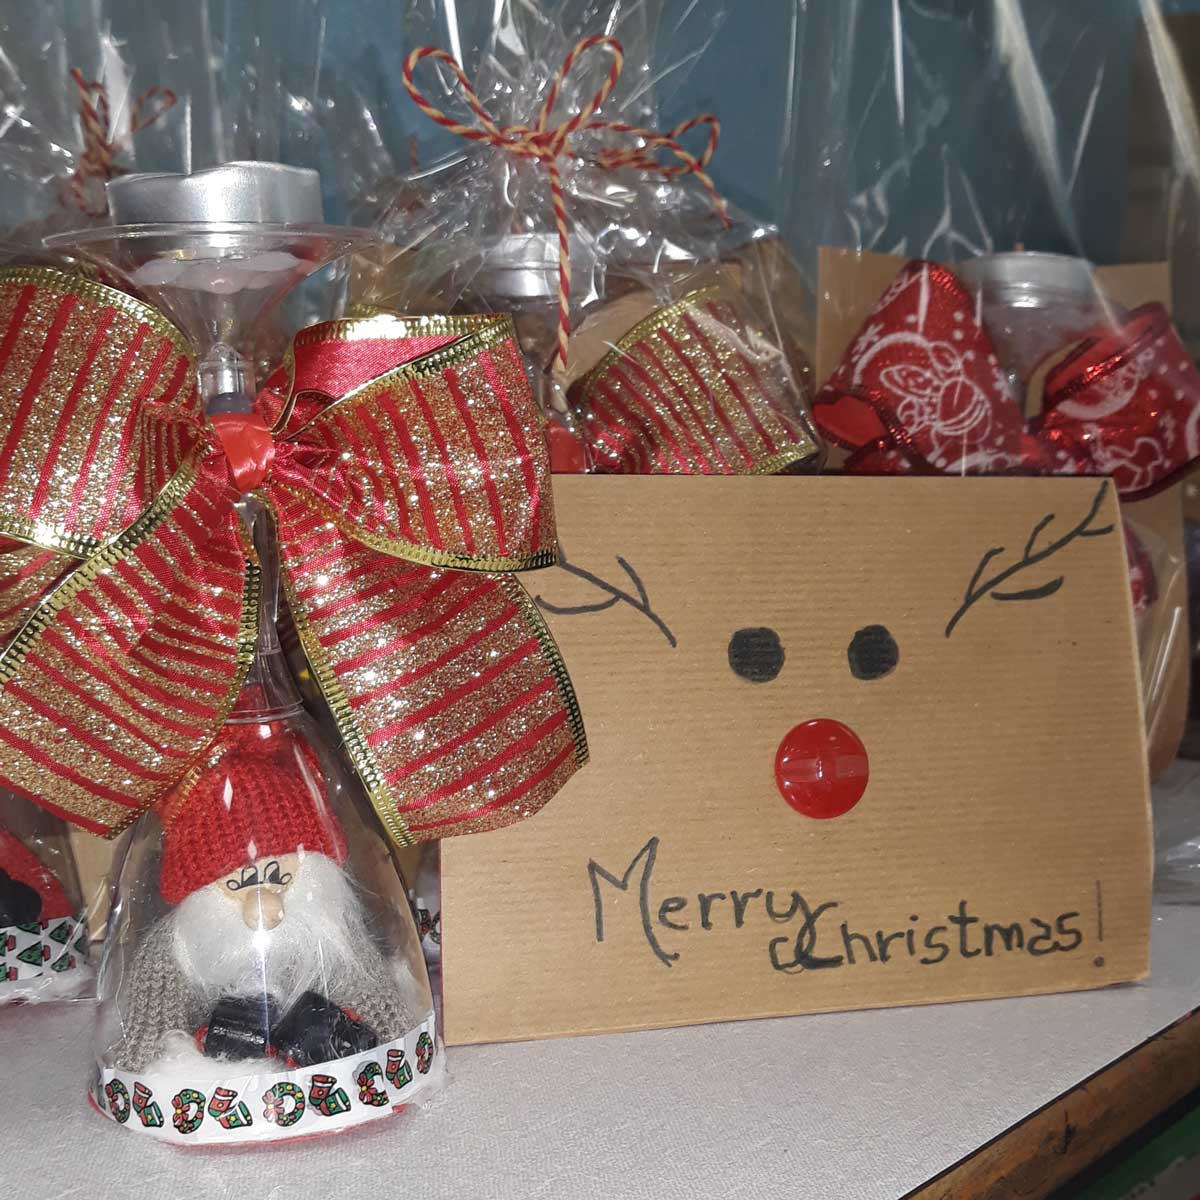 48.--L'-AMORE-a-Natale-allontana-ogni-male!